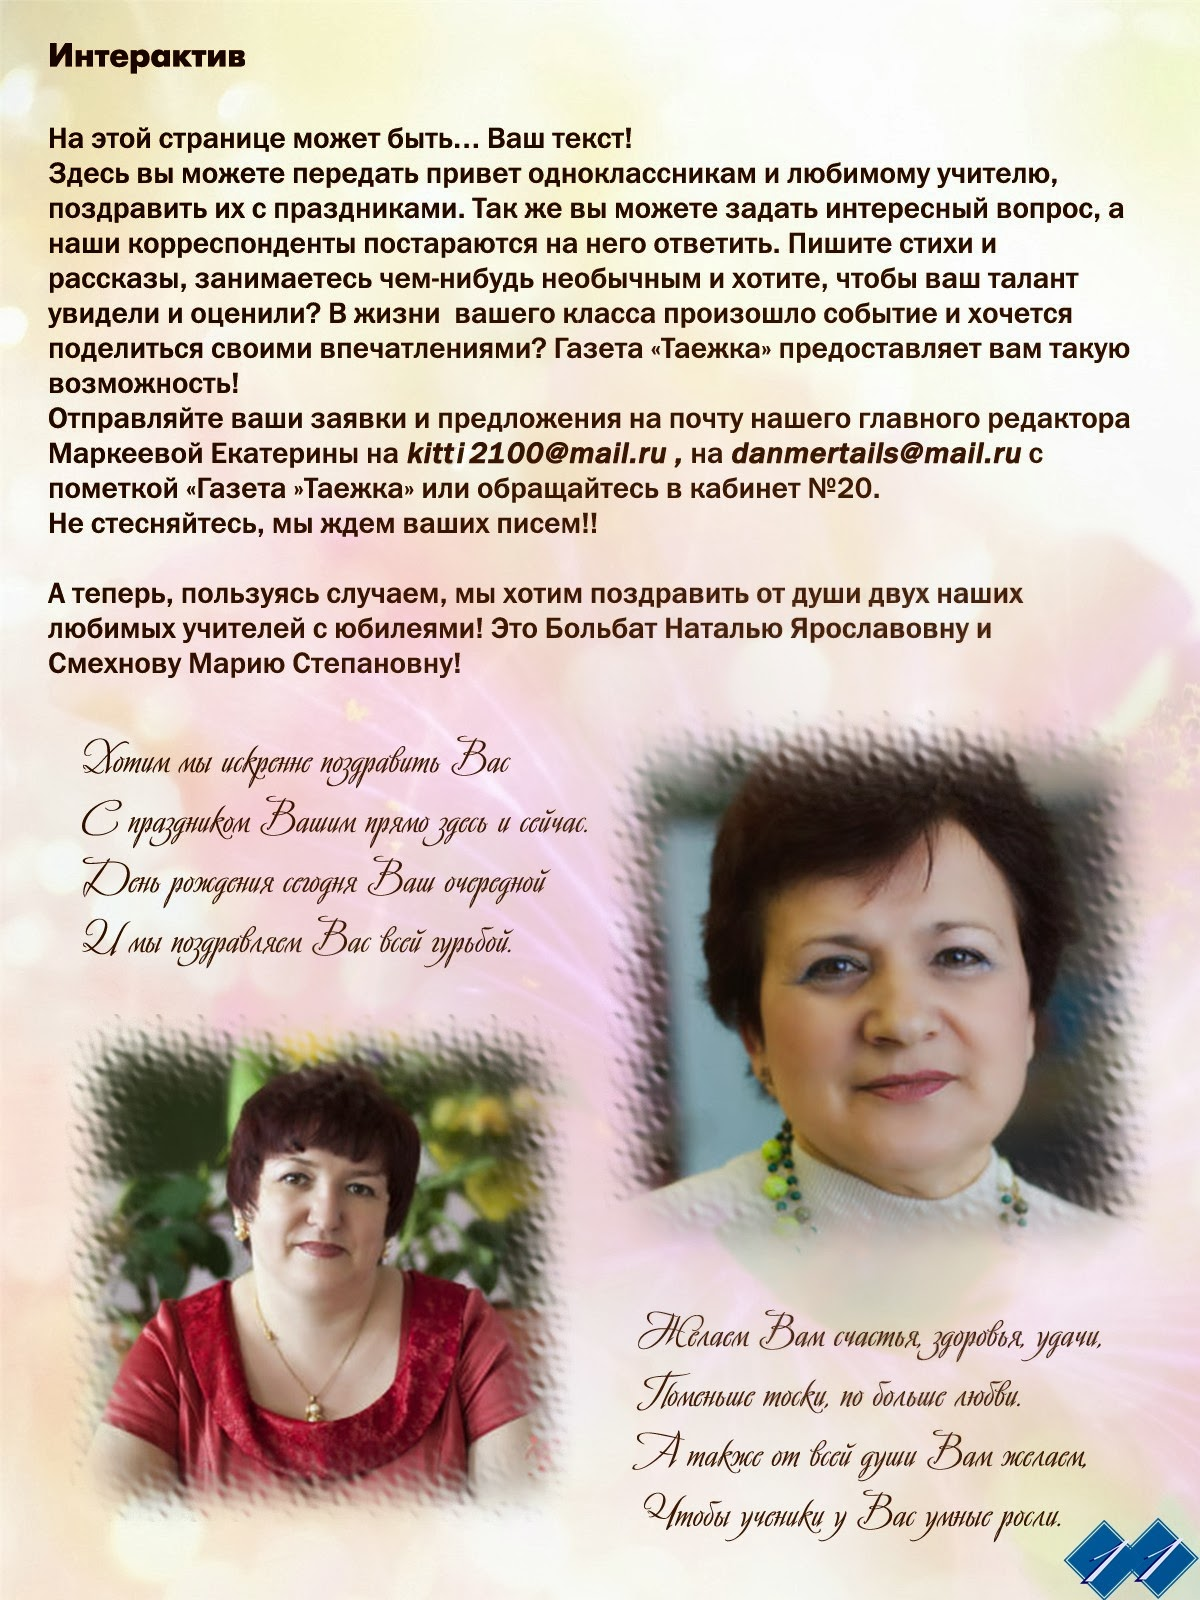 Поздравление учителя юбиляра 9